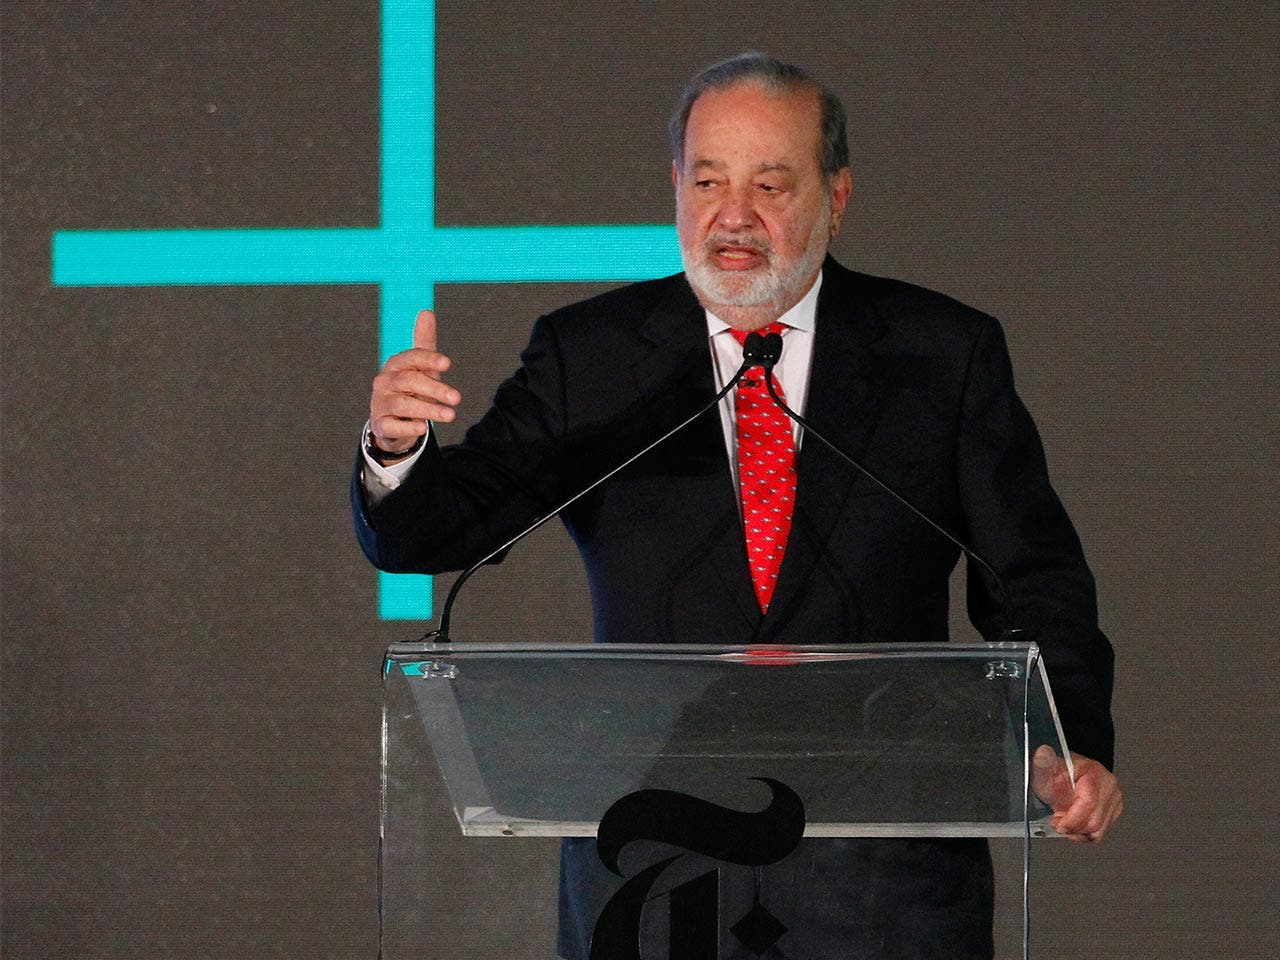 Carlos Slim Helu | Kimberly White/Getty Images